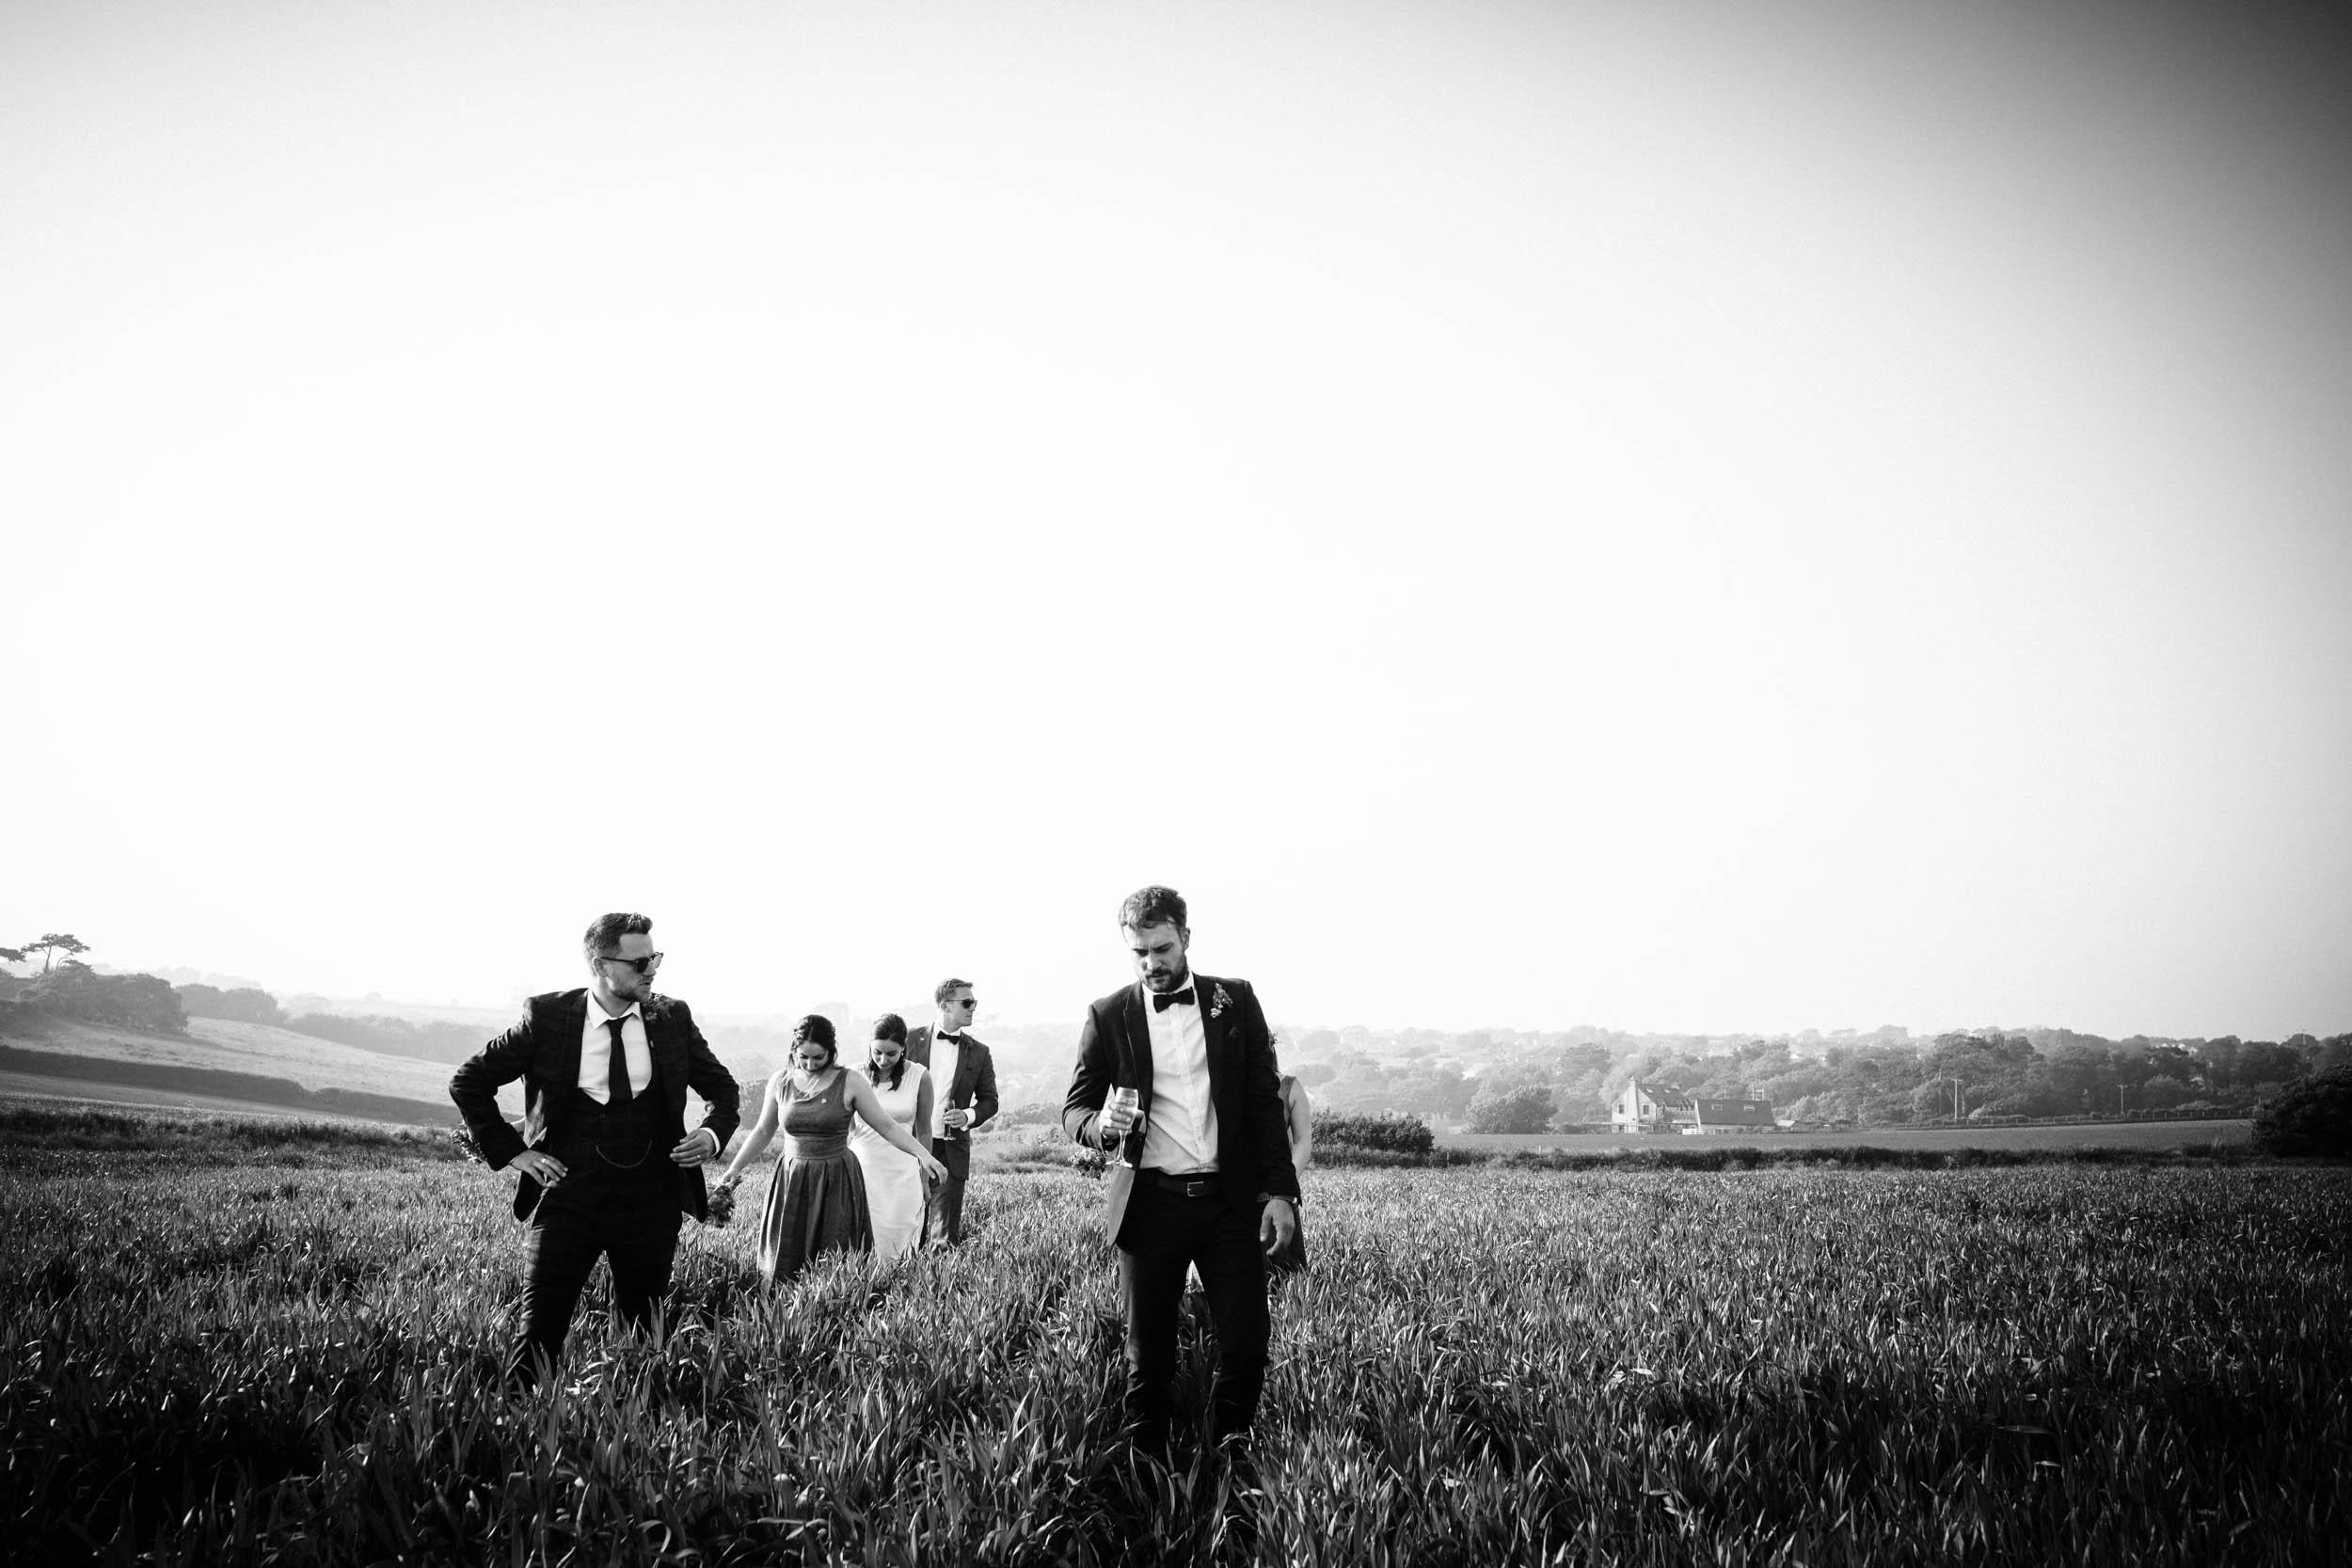 Alex_Sedgmond_Photography-SouthWalesWeddingPhotography-Wedding-Photographer-Cardiff-141.jpg